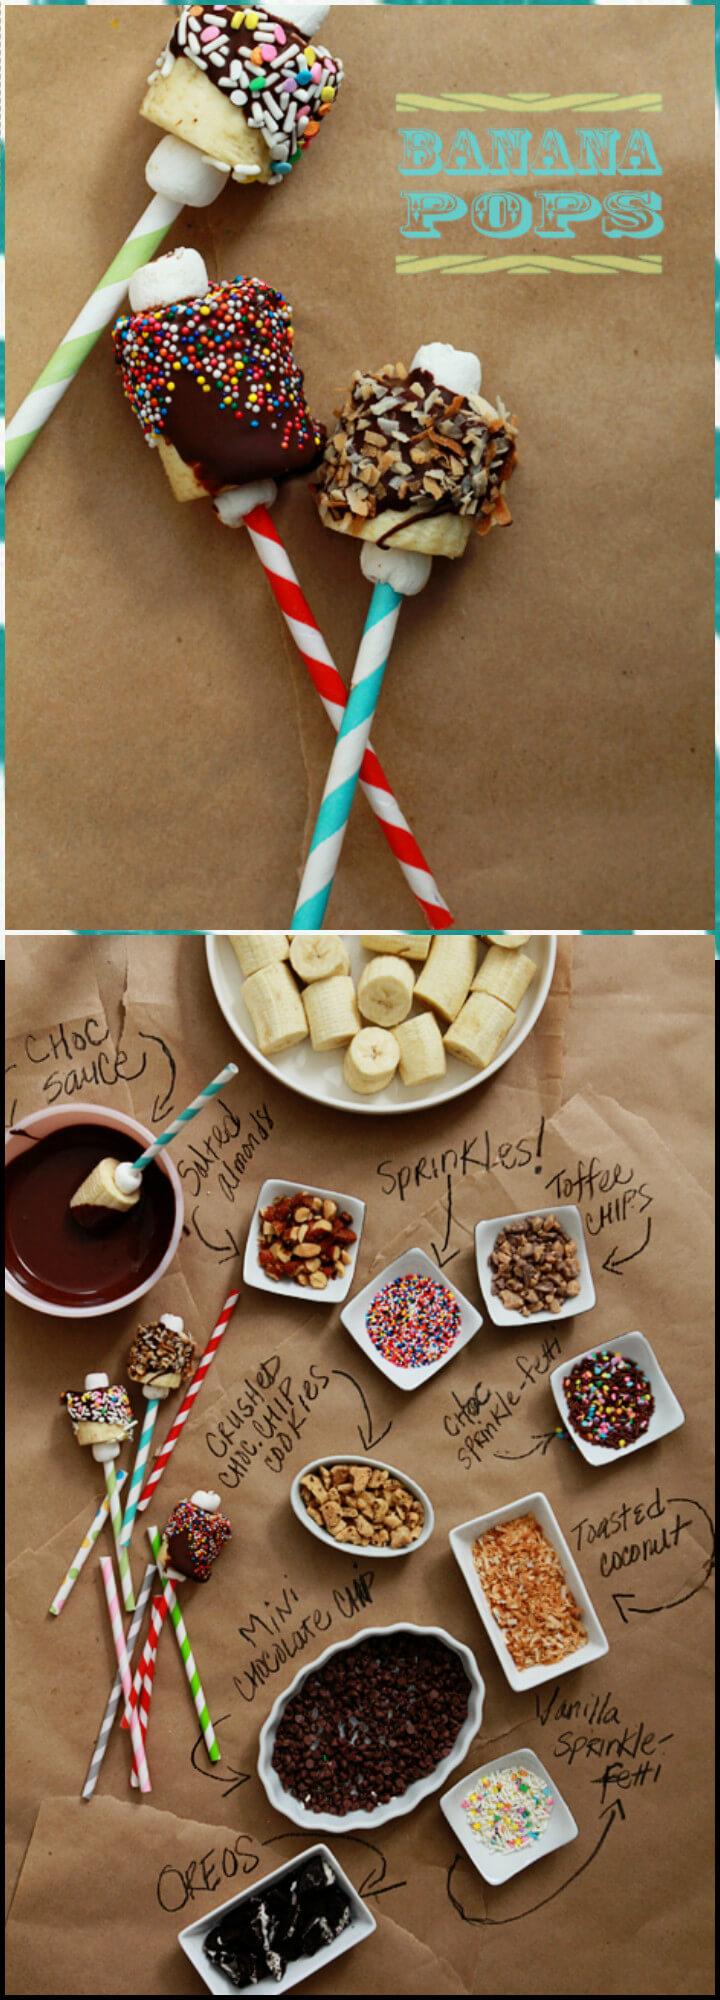 50+ DIY Graduation Party Ideas & Decorations - Page 4 of 4 ...